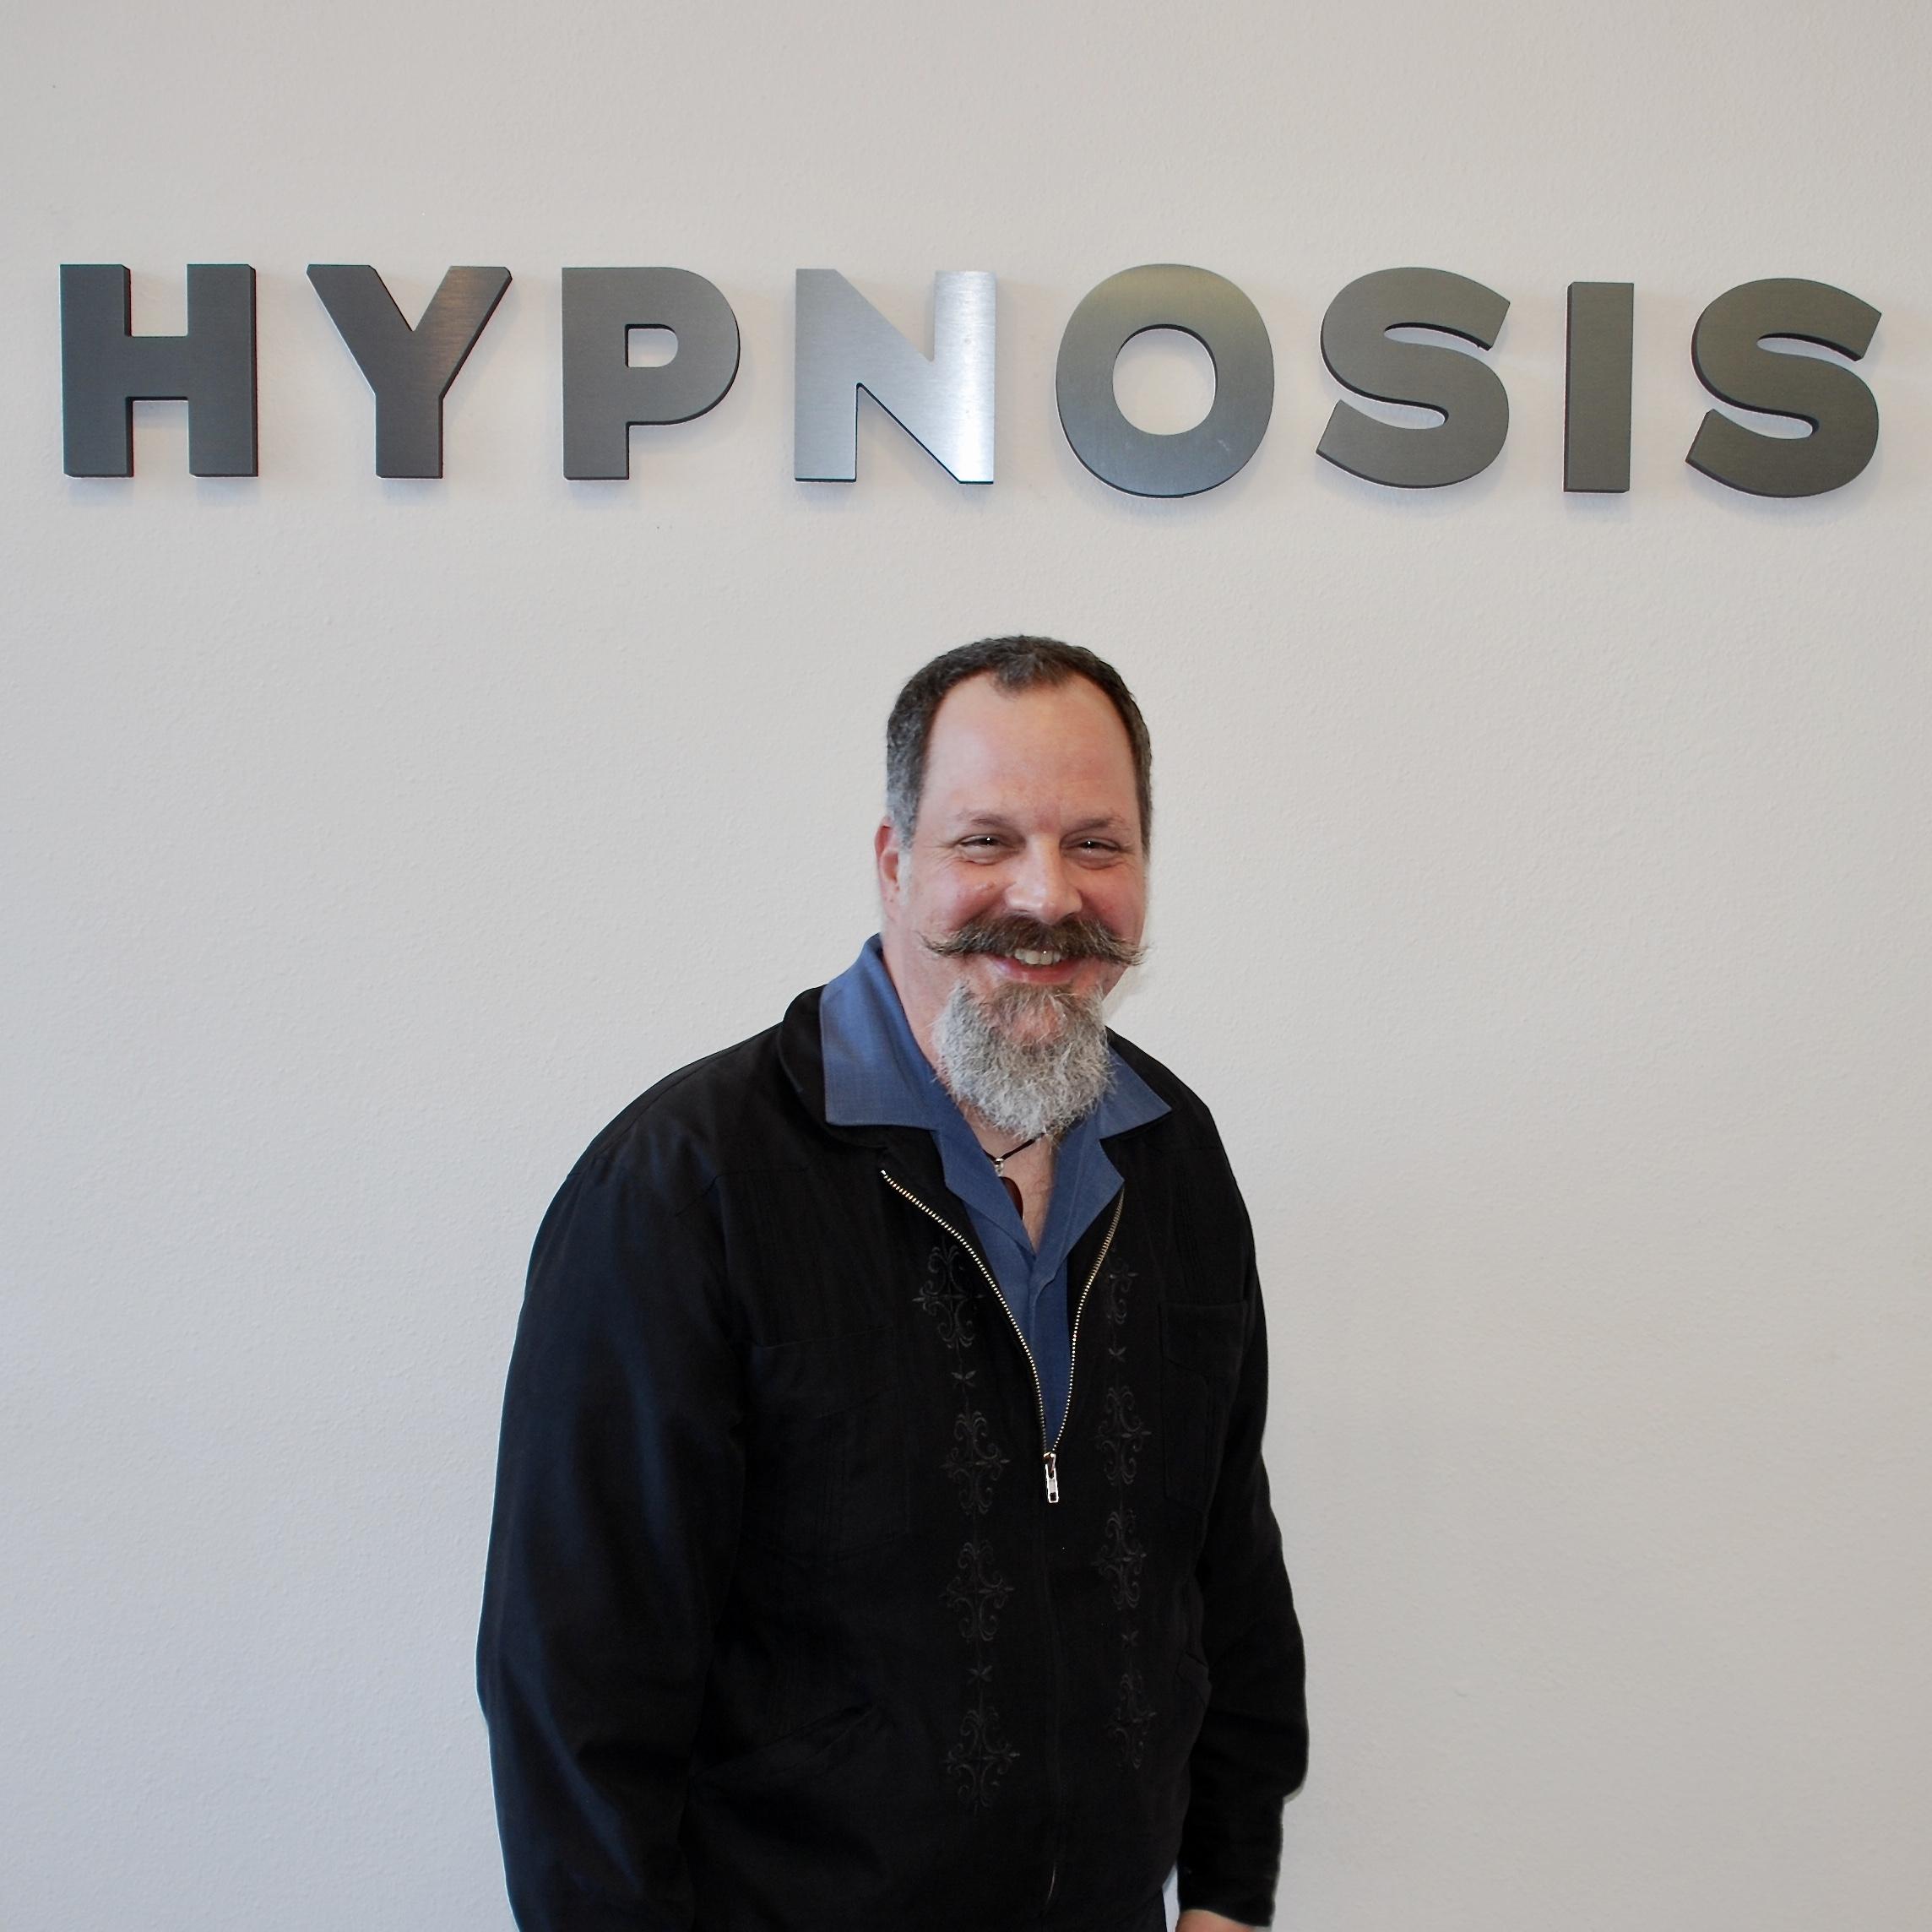 Deane-Benninghoven-Hypnosis.jpeg